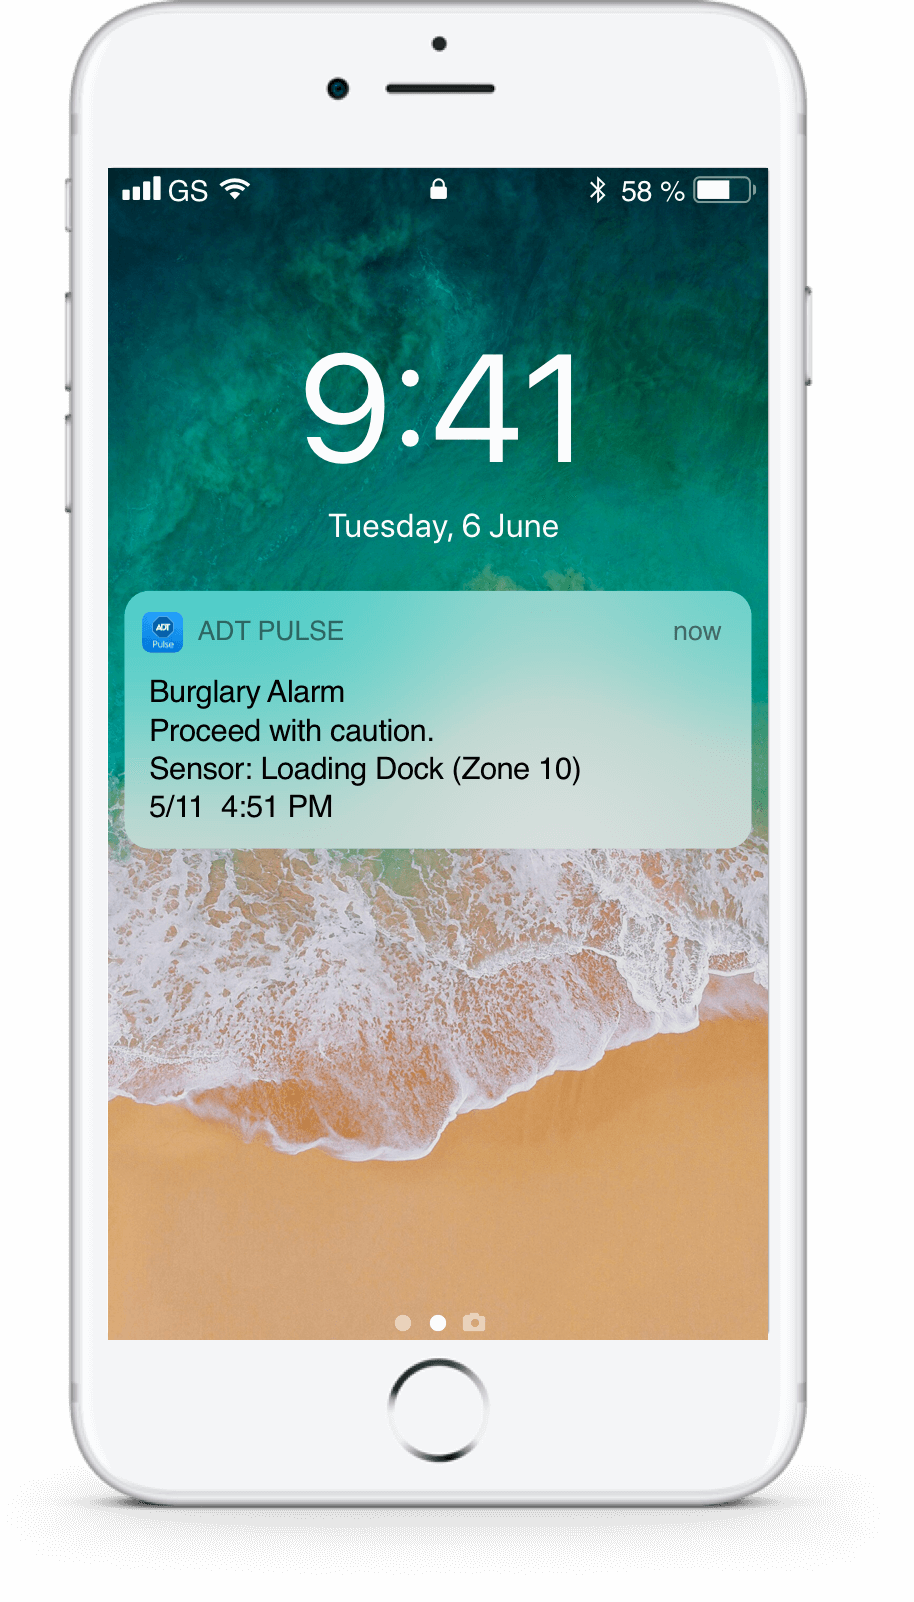 adt mobile app alert